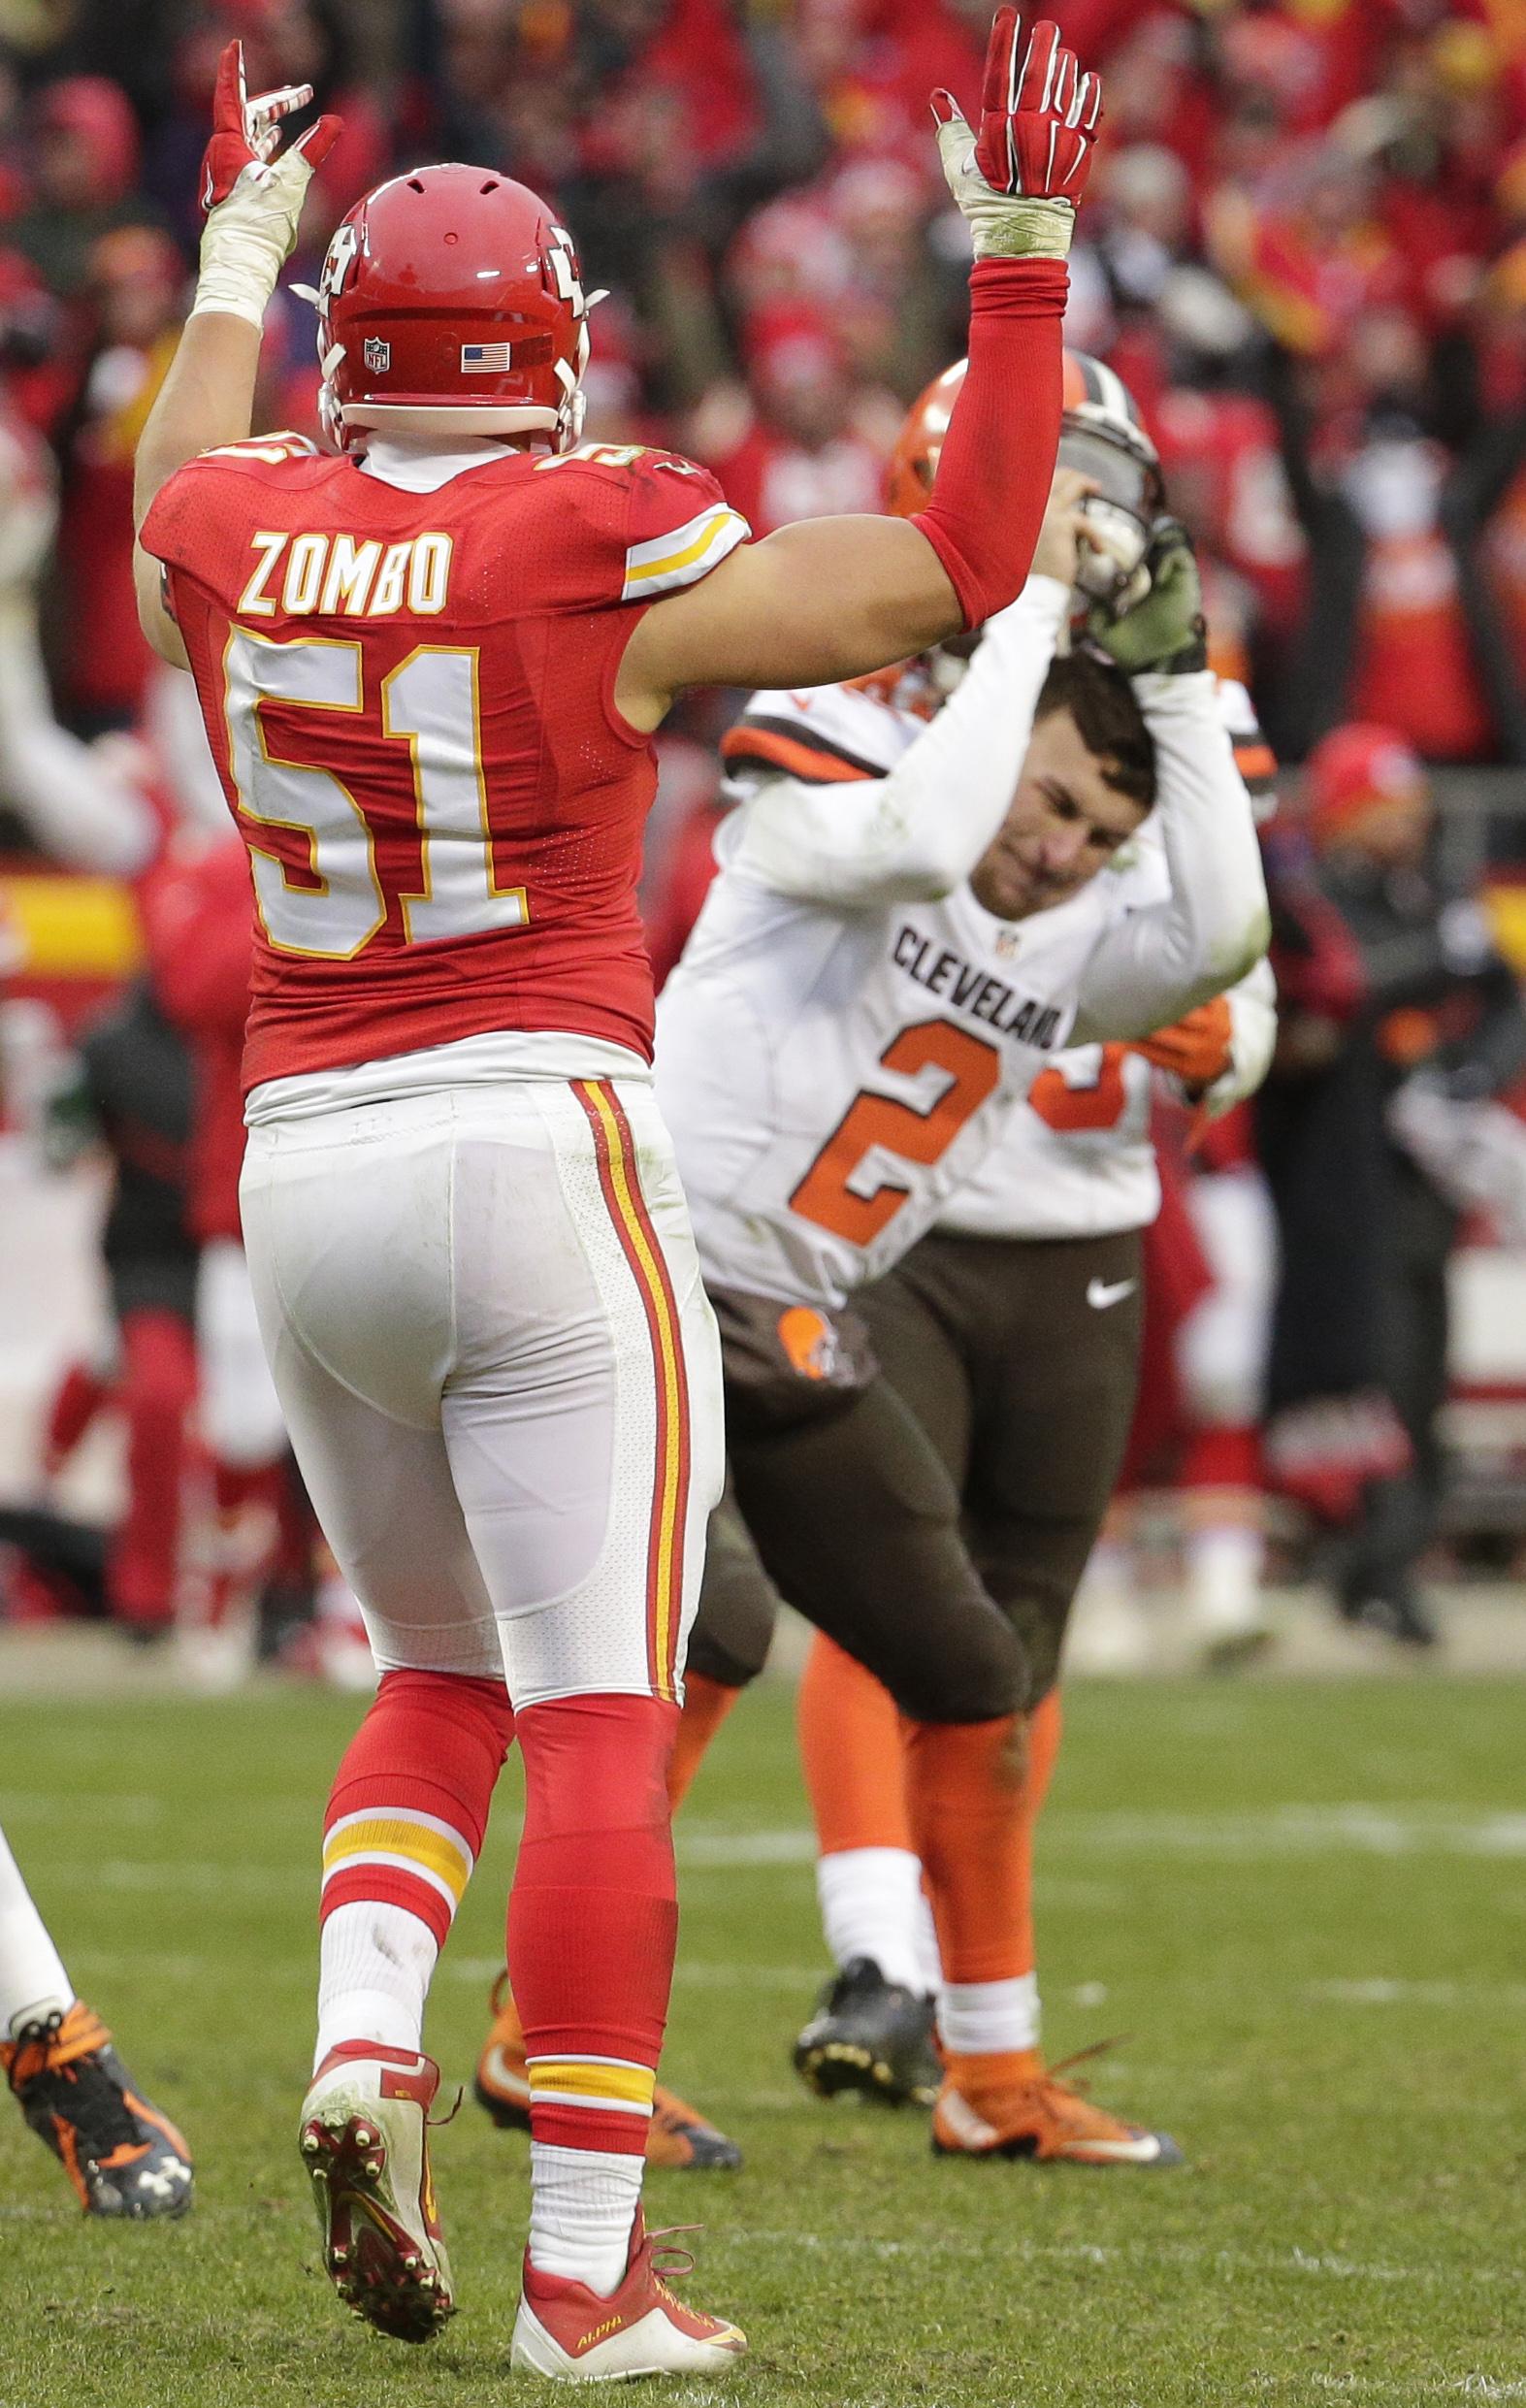 Cleveland Browns quarterback Johnny Manziel (2) slams his helmet as Kansas City Chiefs linebacker Frank Zombo (51) celebrates following an NFL football game in Kansas City, Mo., Sunday, Dec. 27, 2015. The Kansas City Chiefs won 17-13. (AP Photo/Charlie Ri